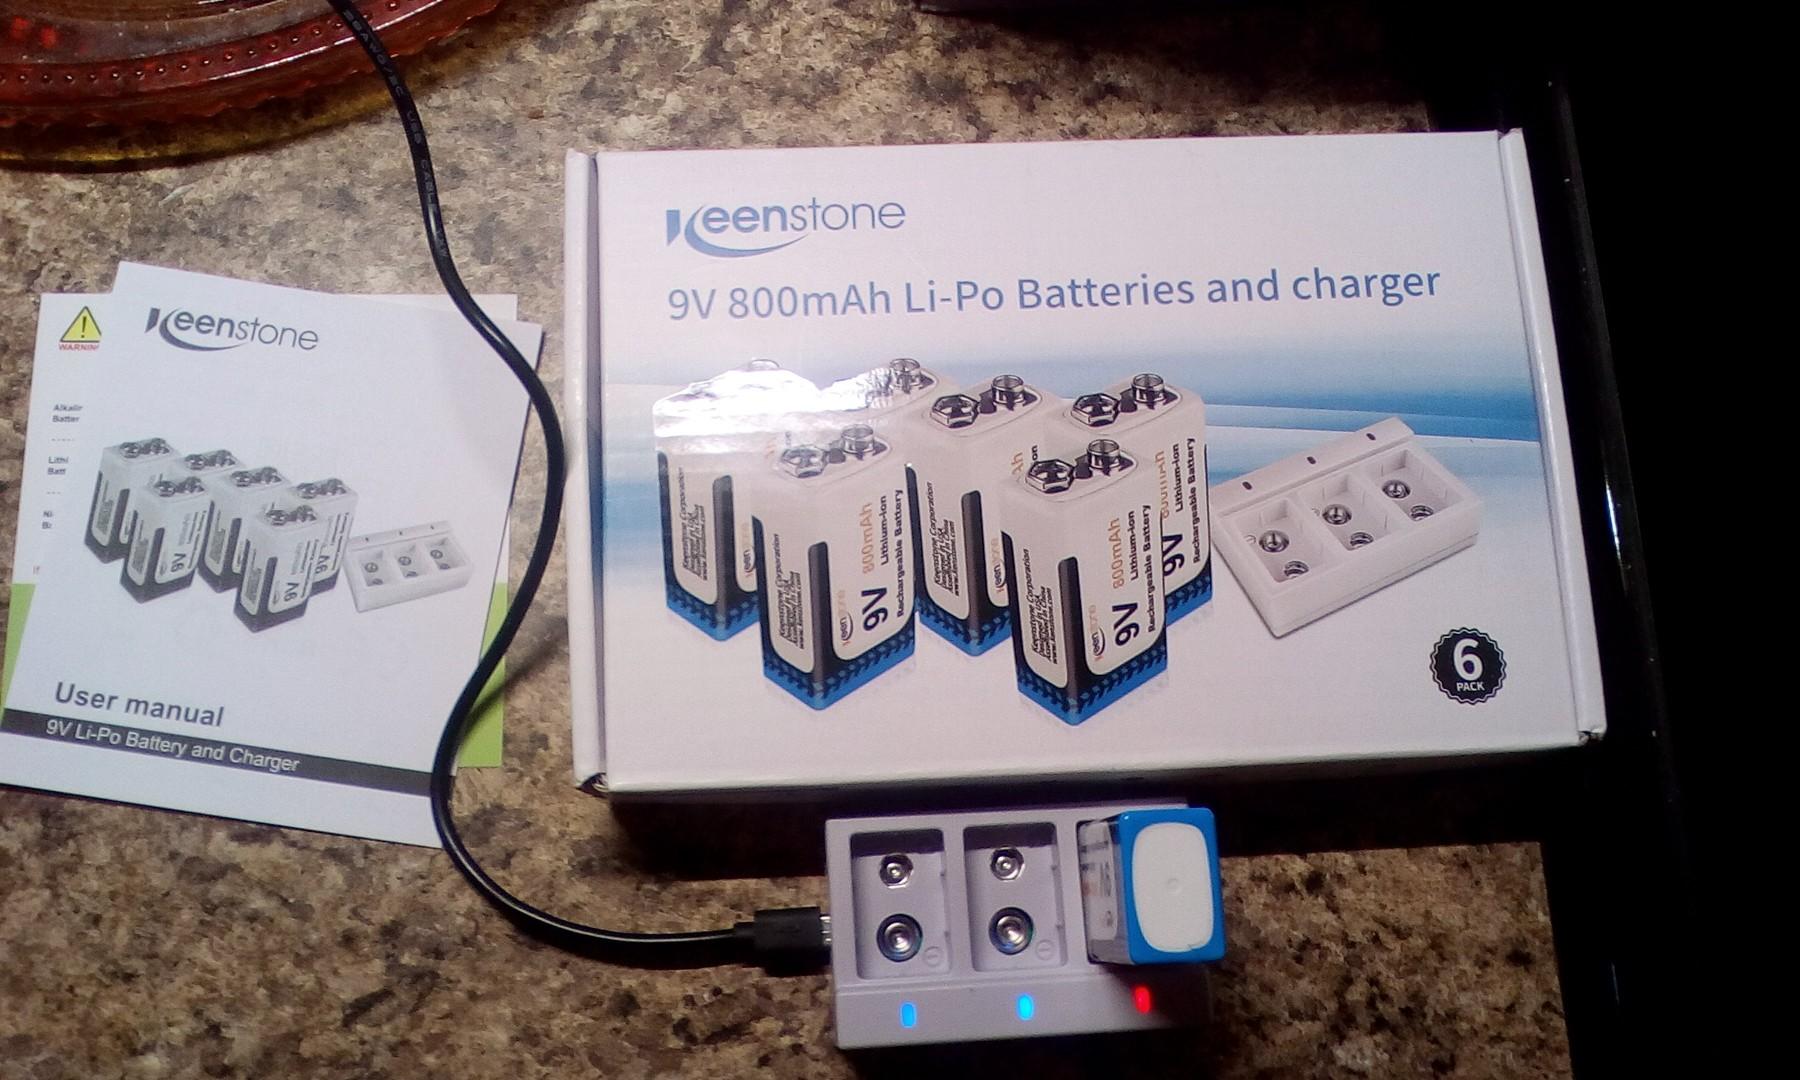 Newest battery technology